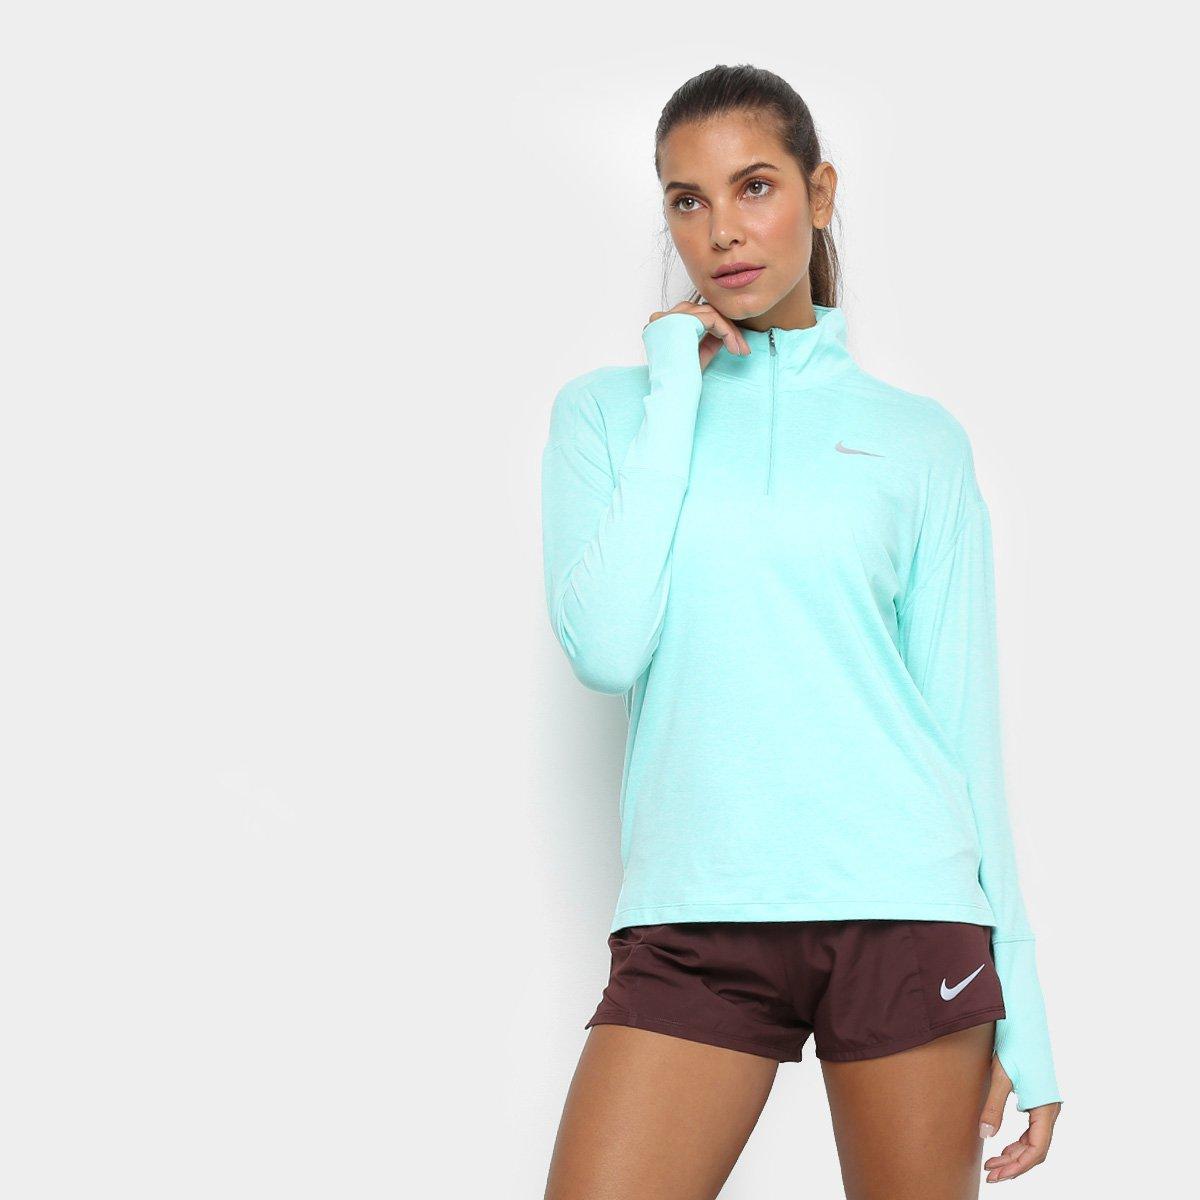 66cea1c5709 Jaqueta Nike Element Top HZ Feminina - Azul Turquesa - Compre Agora ...